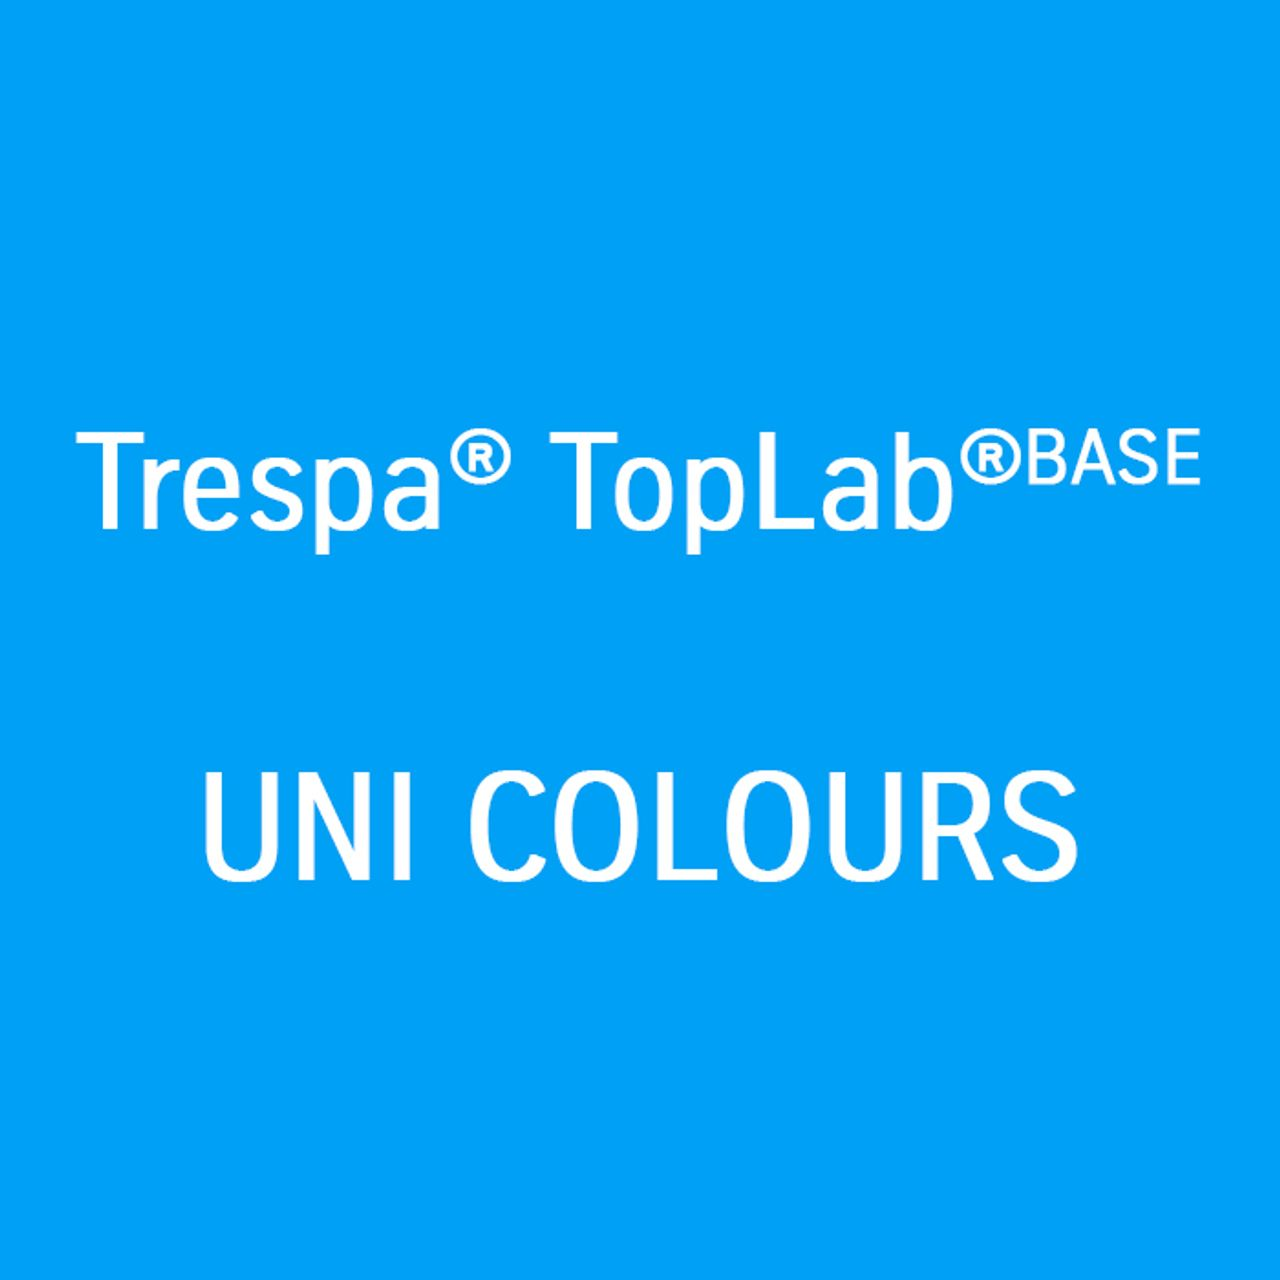 Trespa Top Lab Base Uni Colours